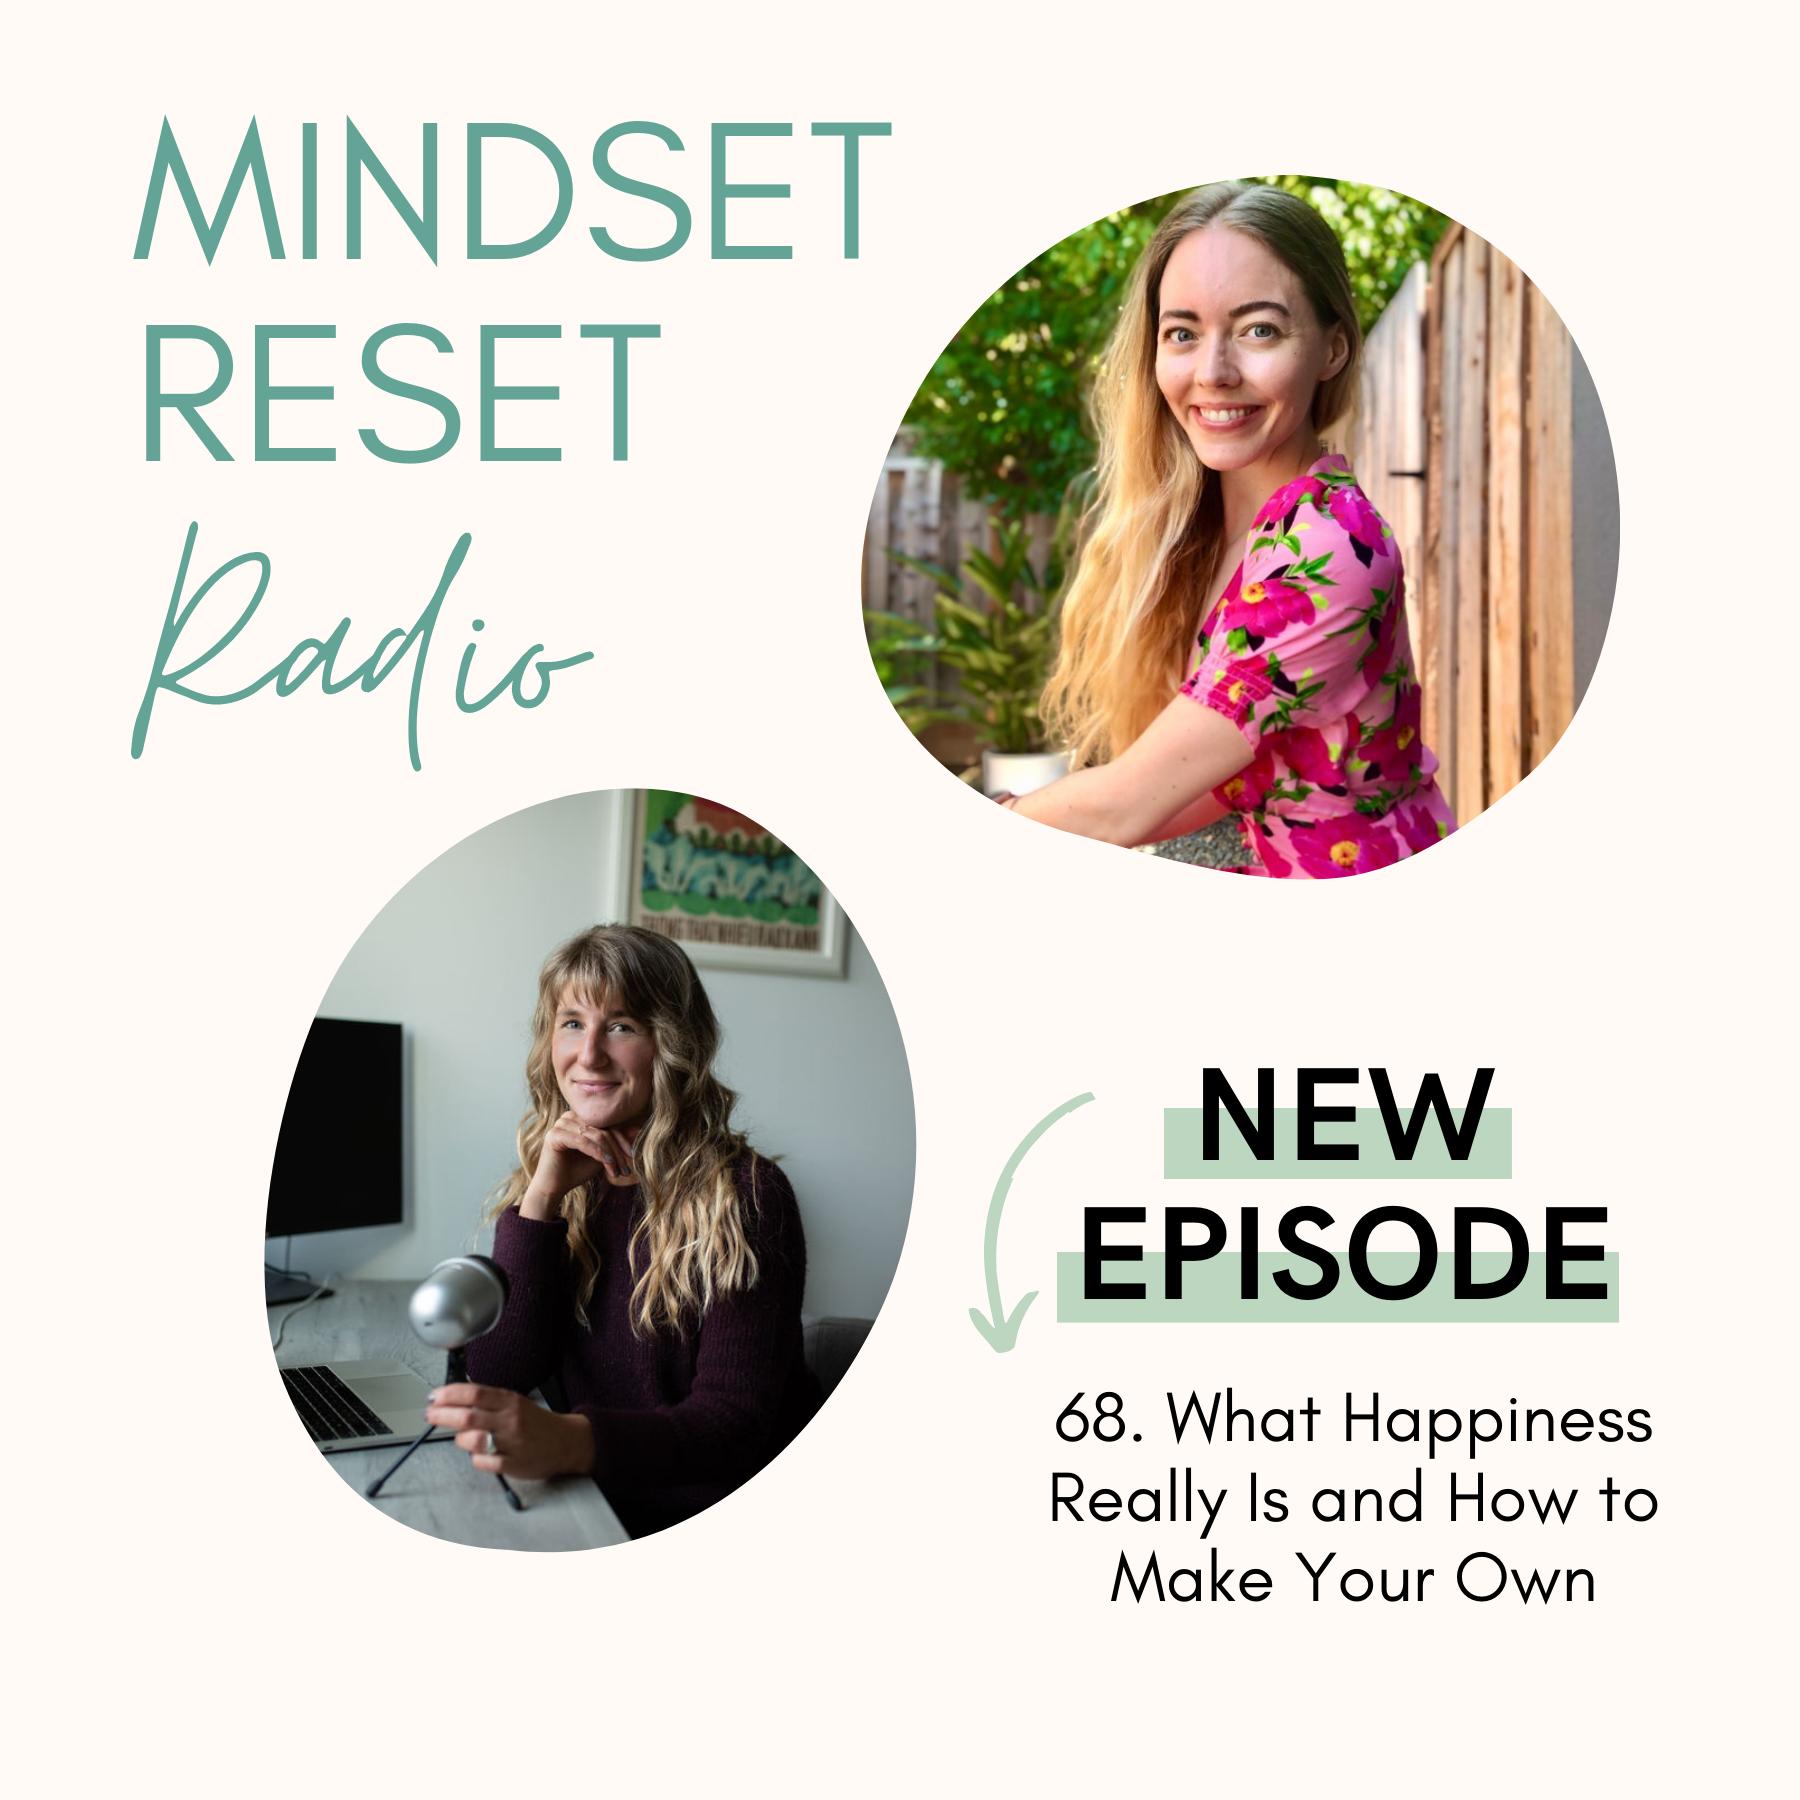 Artwork for podcast Mindset Reset Radio